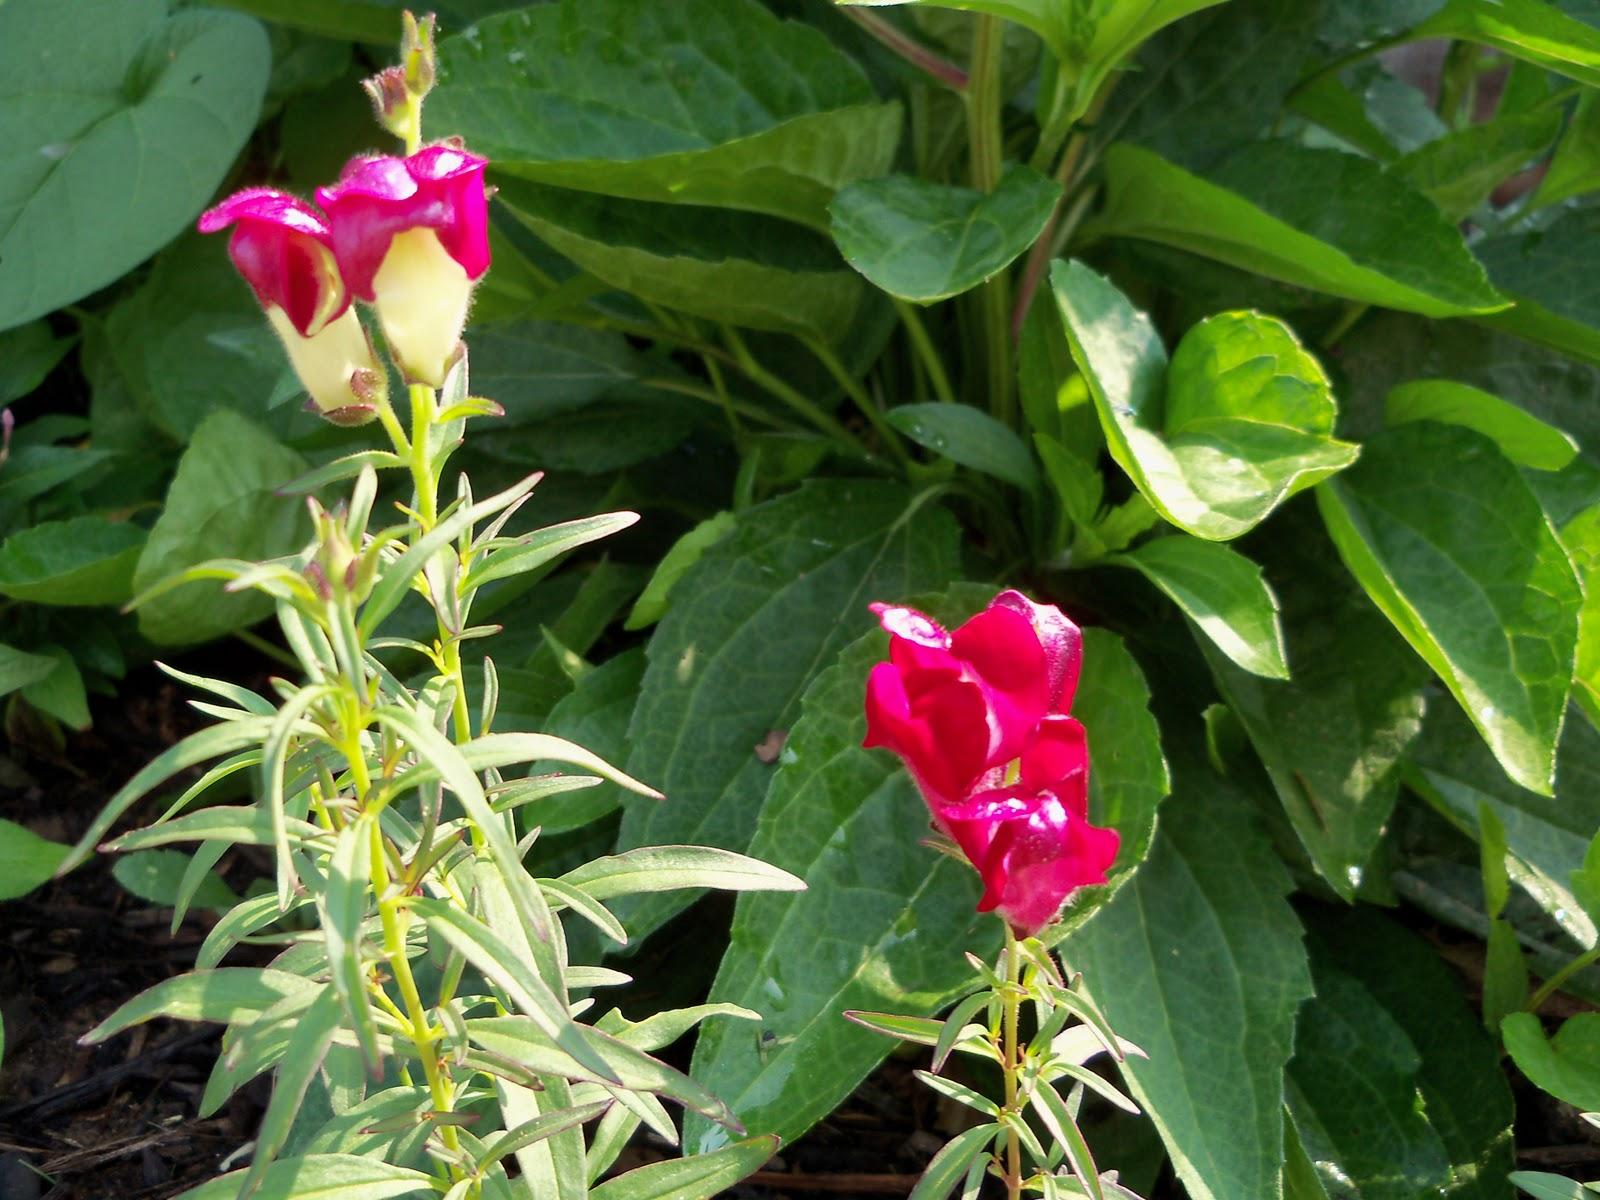 Gardening 2010, Part Two - 101_3334.JPG